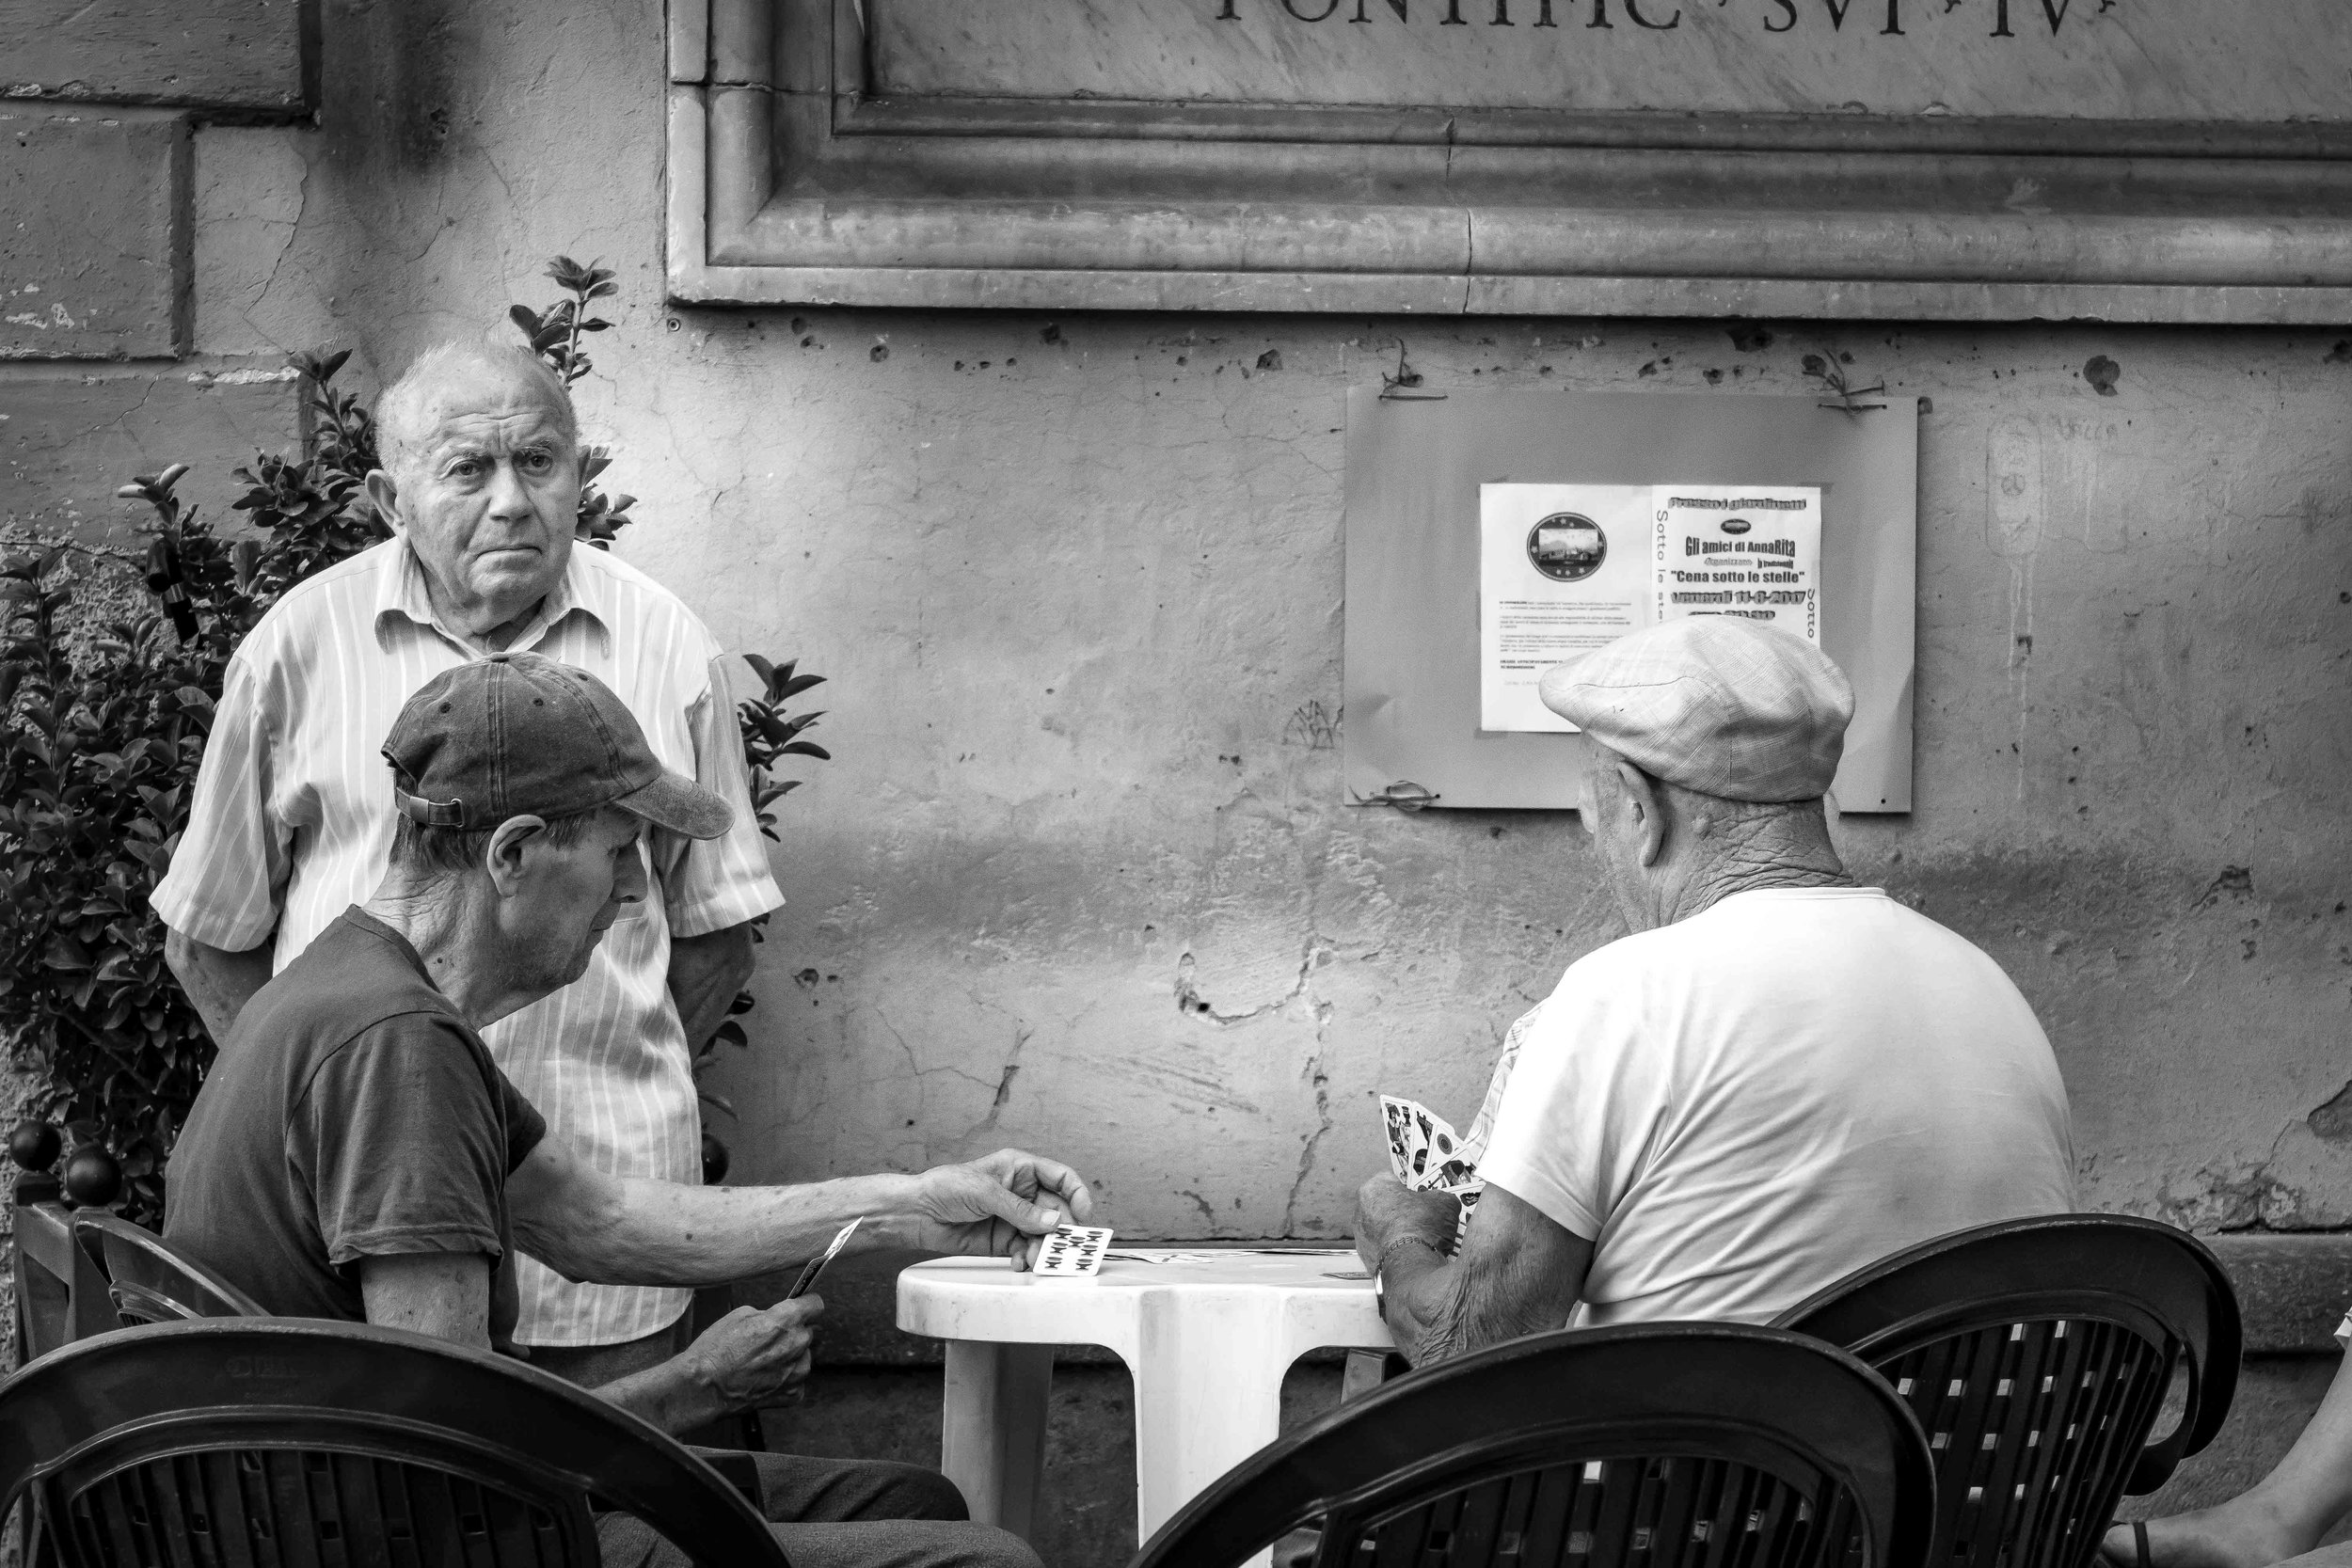 viewfinder-straatfotografie-oude-mannen-in-Collevecchio-4.jpg